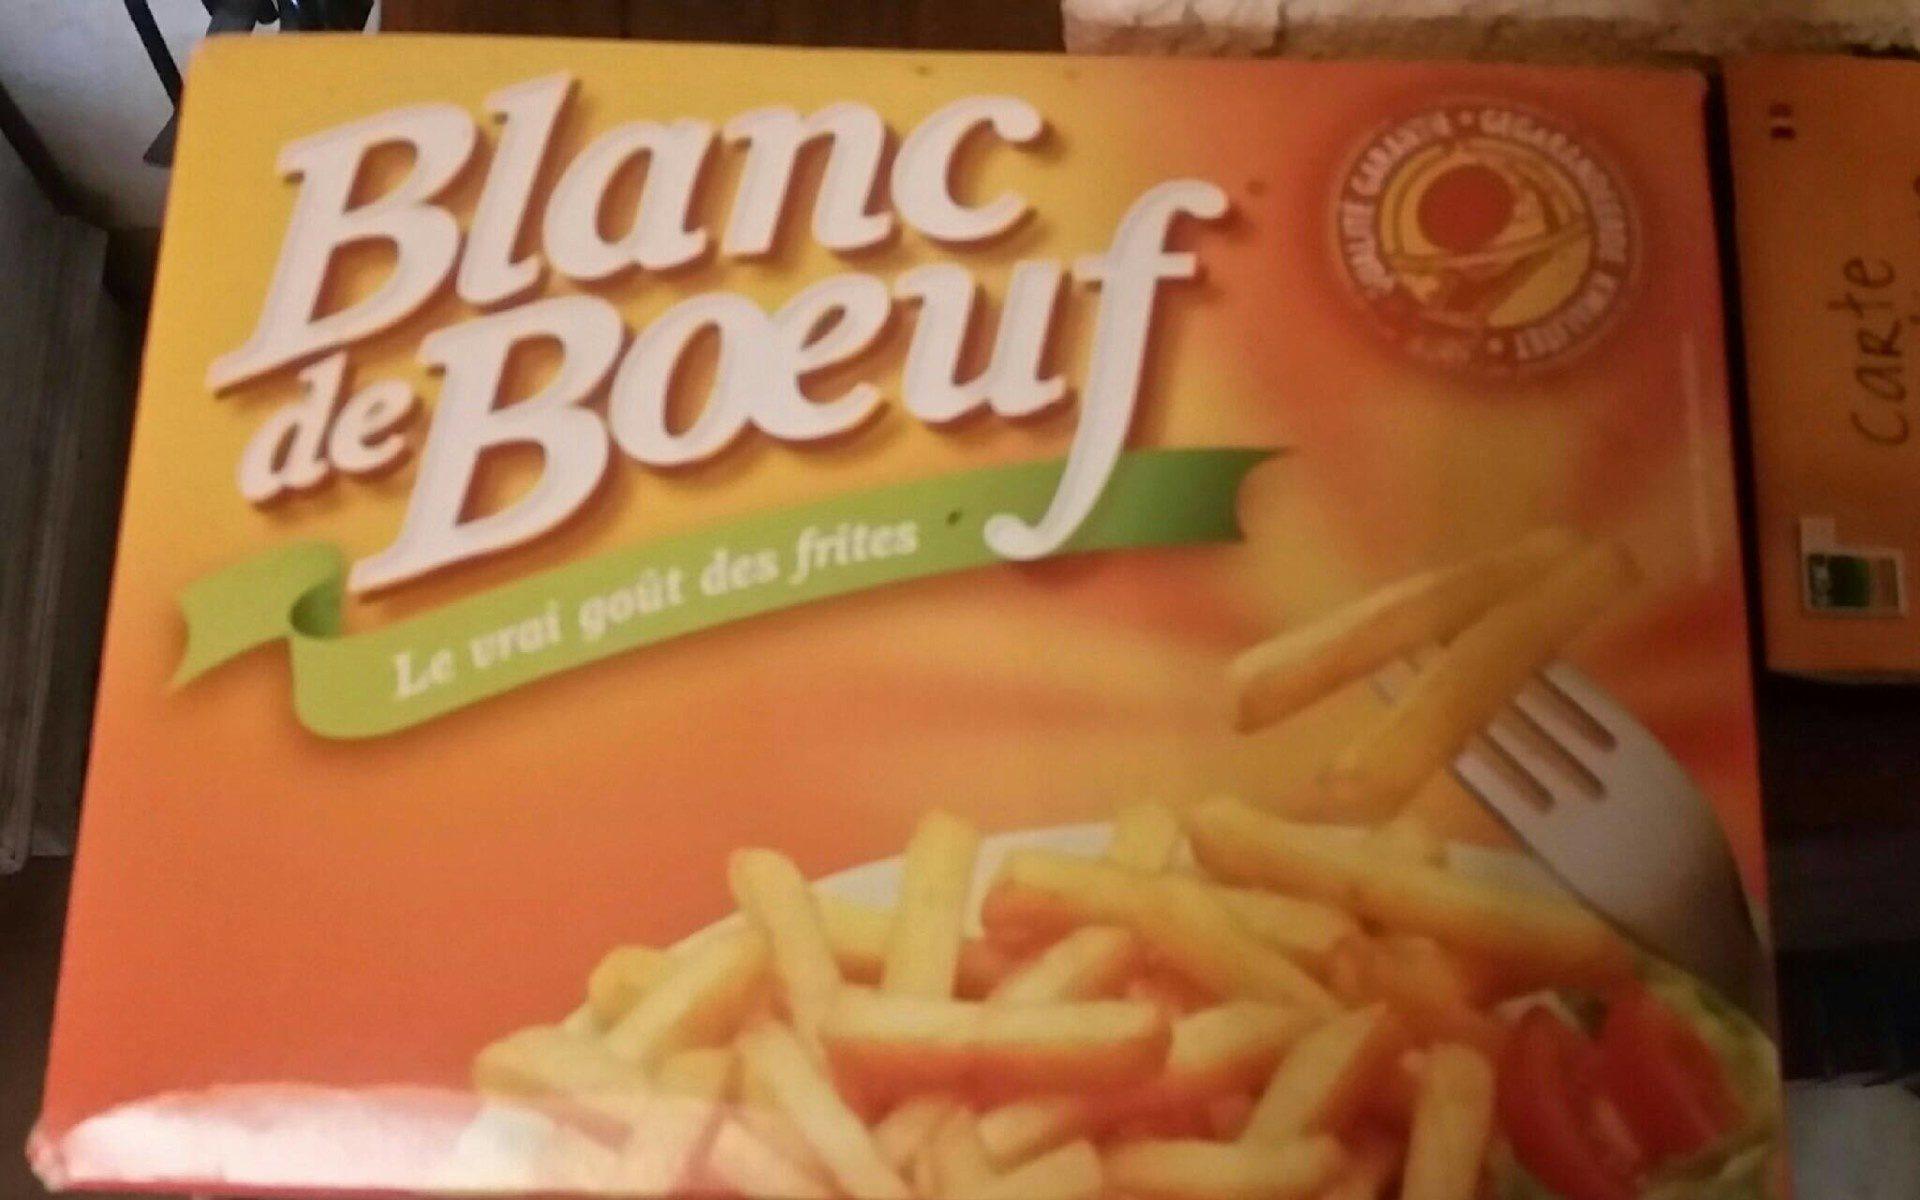 Blanc de boeuf - Product - fr